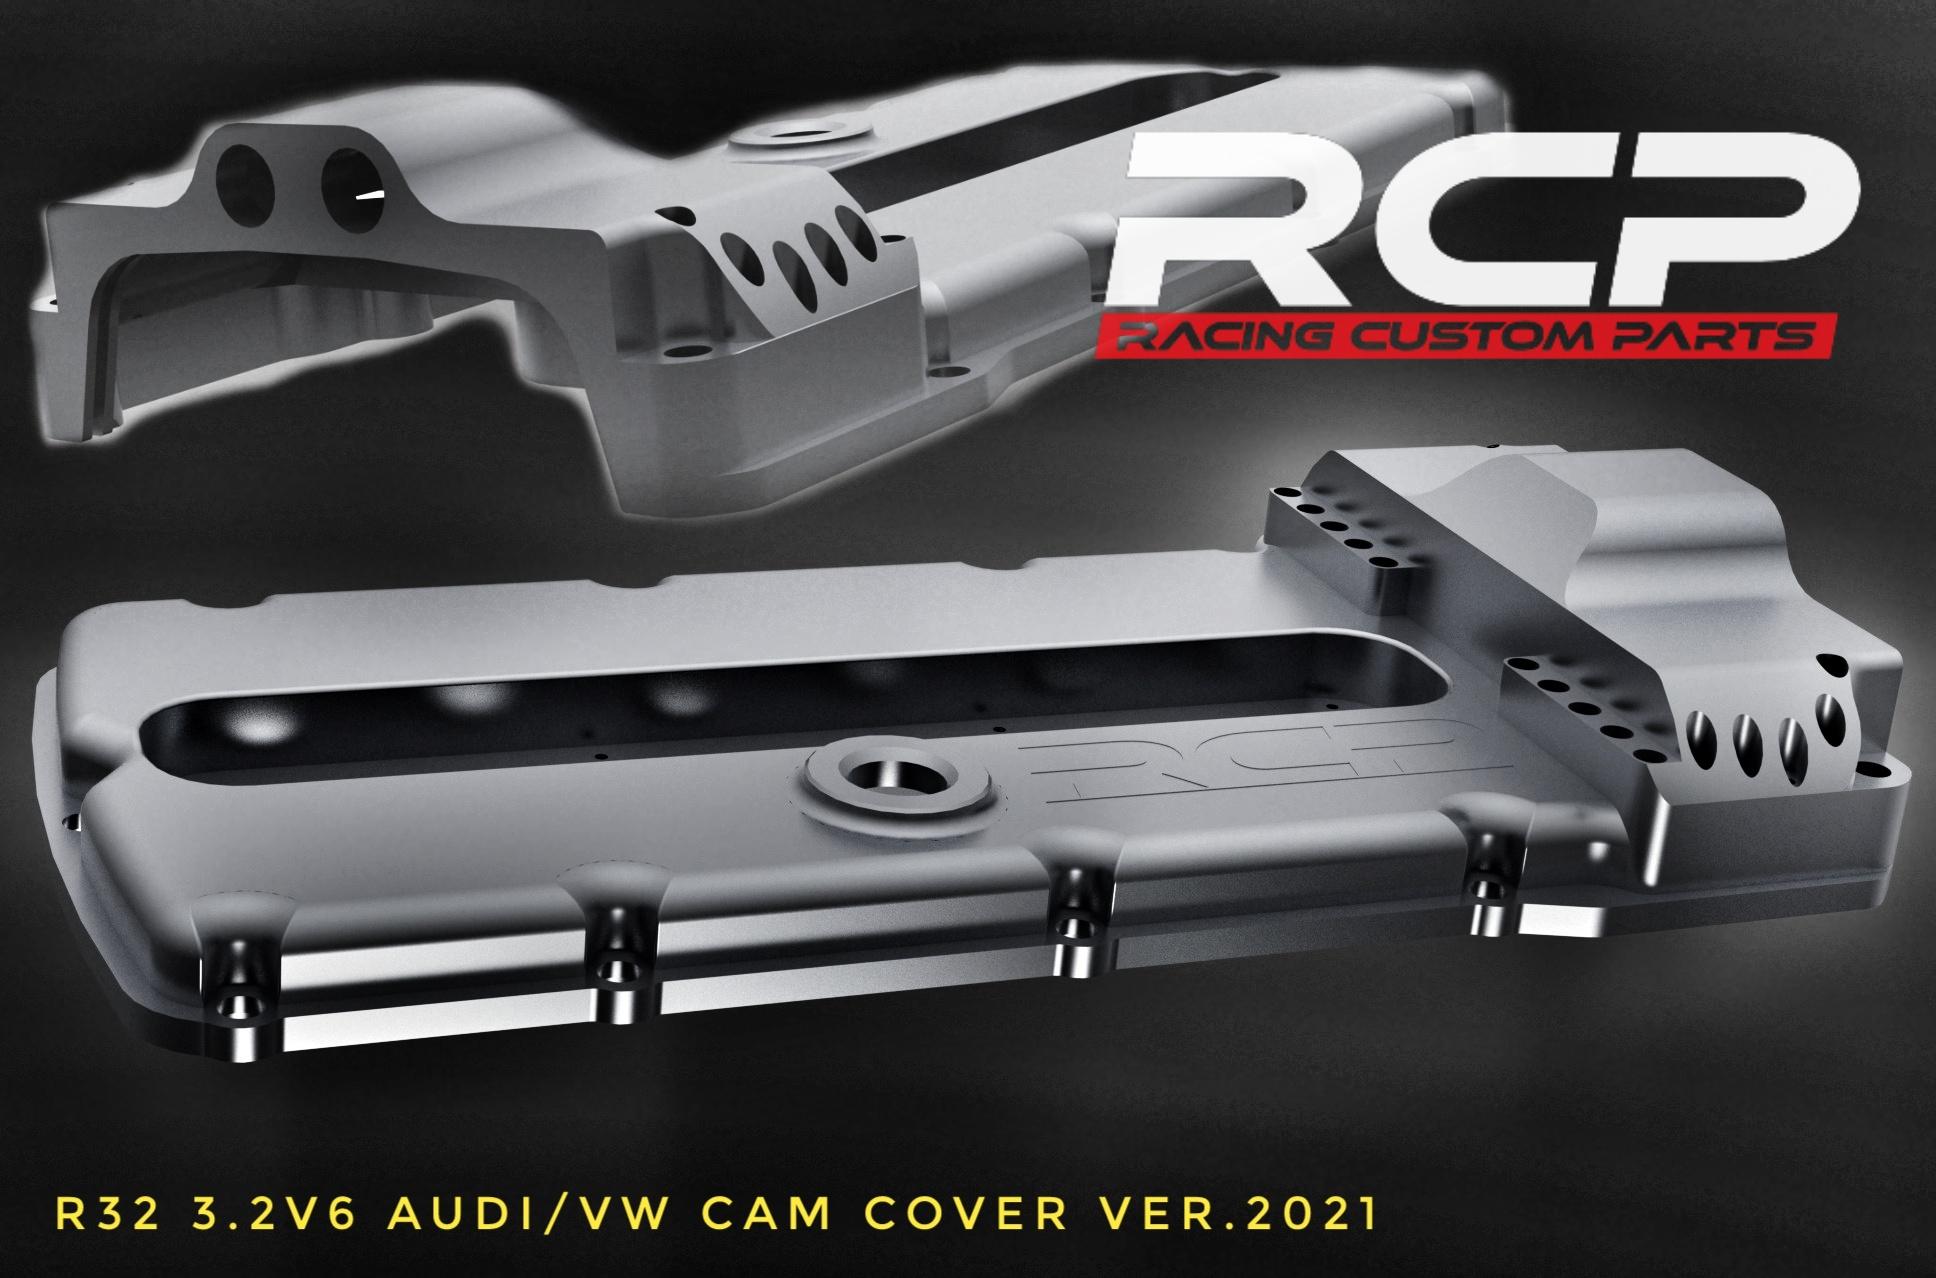 billet machining cnc r32 r36 head cam cover rcp racing custom parts turbo vw audi